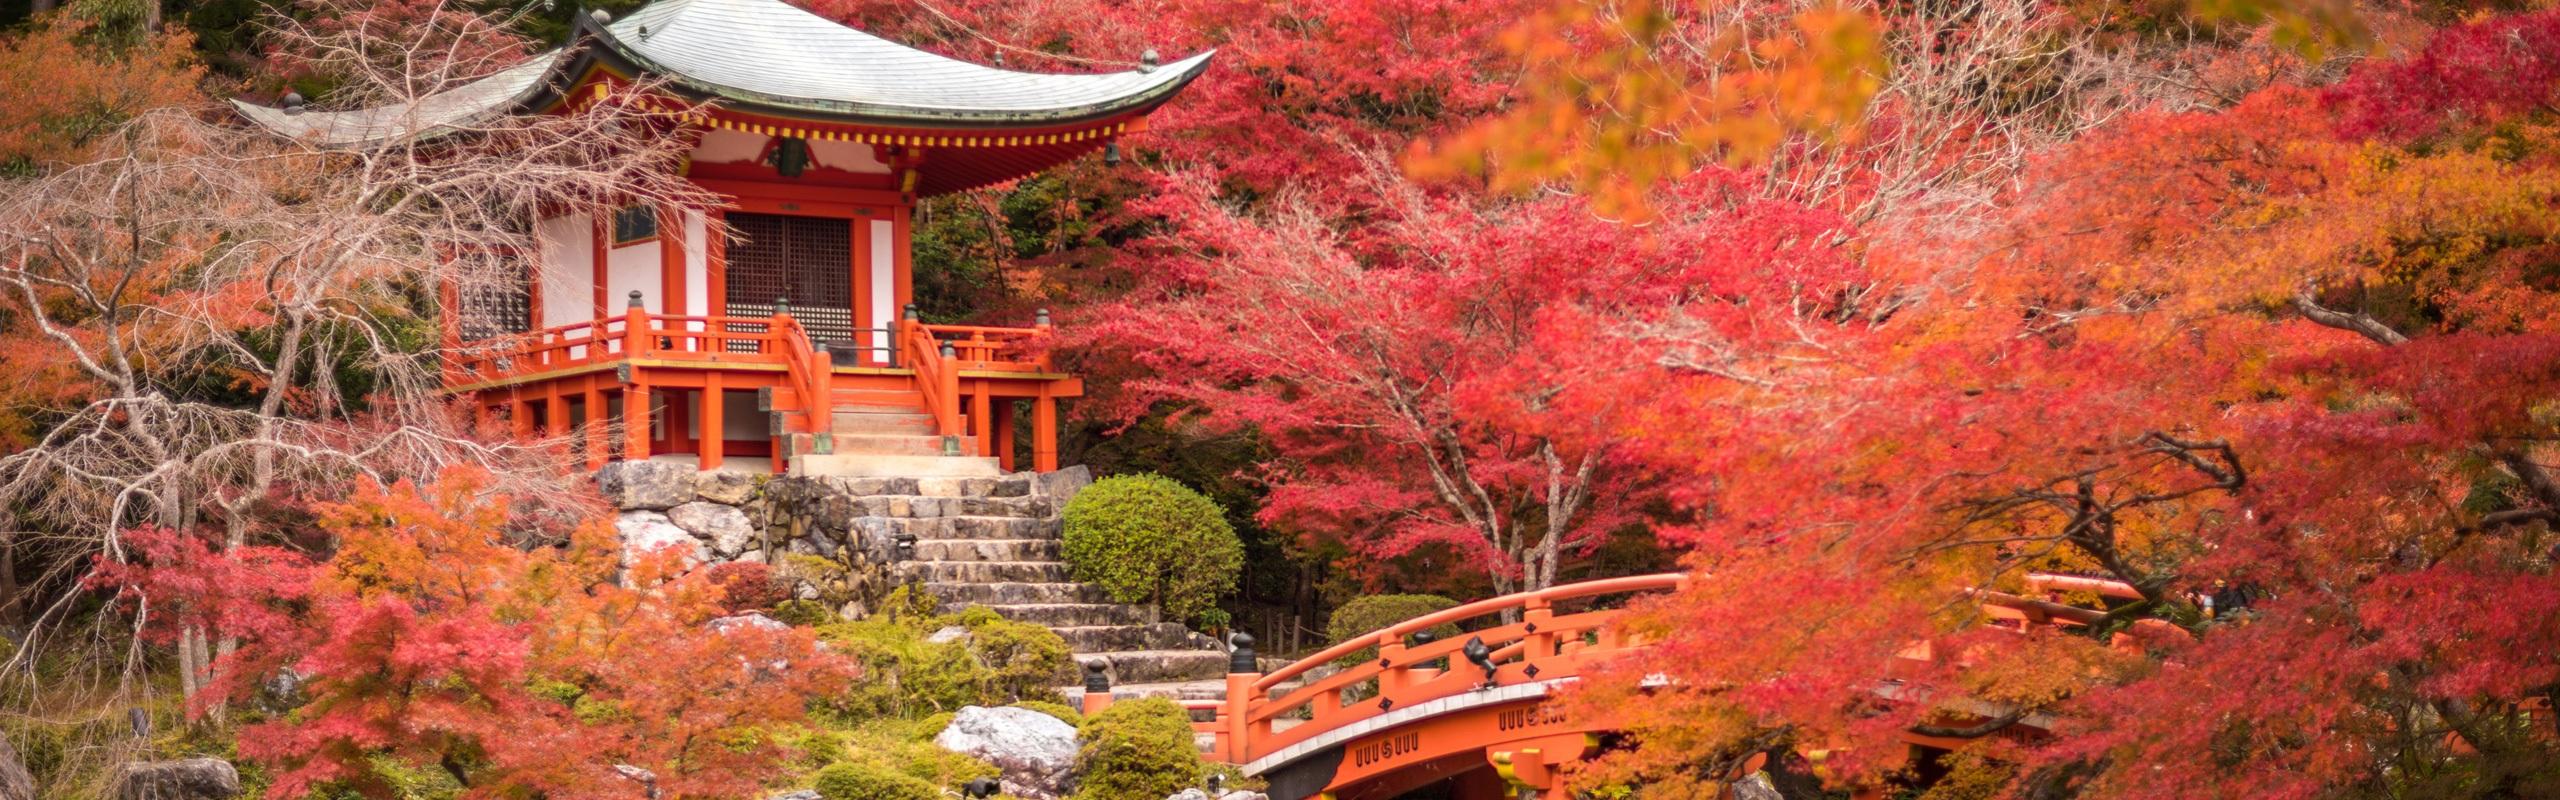 5-Day Tokyo Highlights Tour